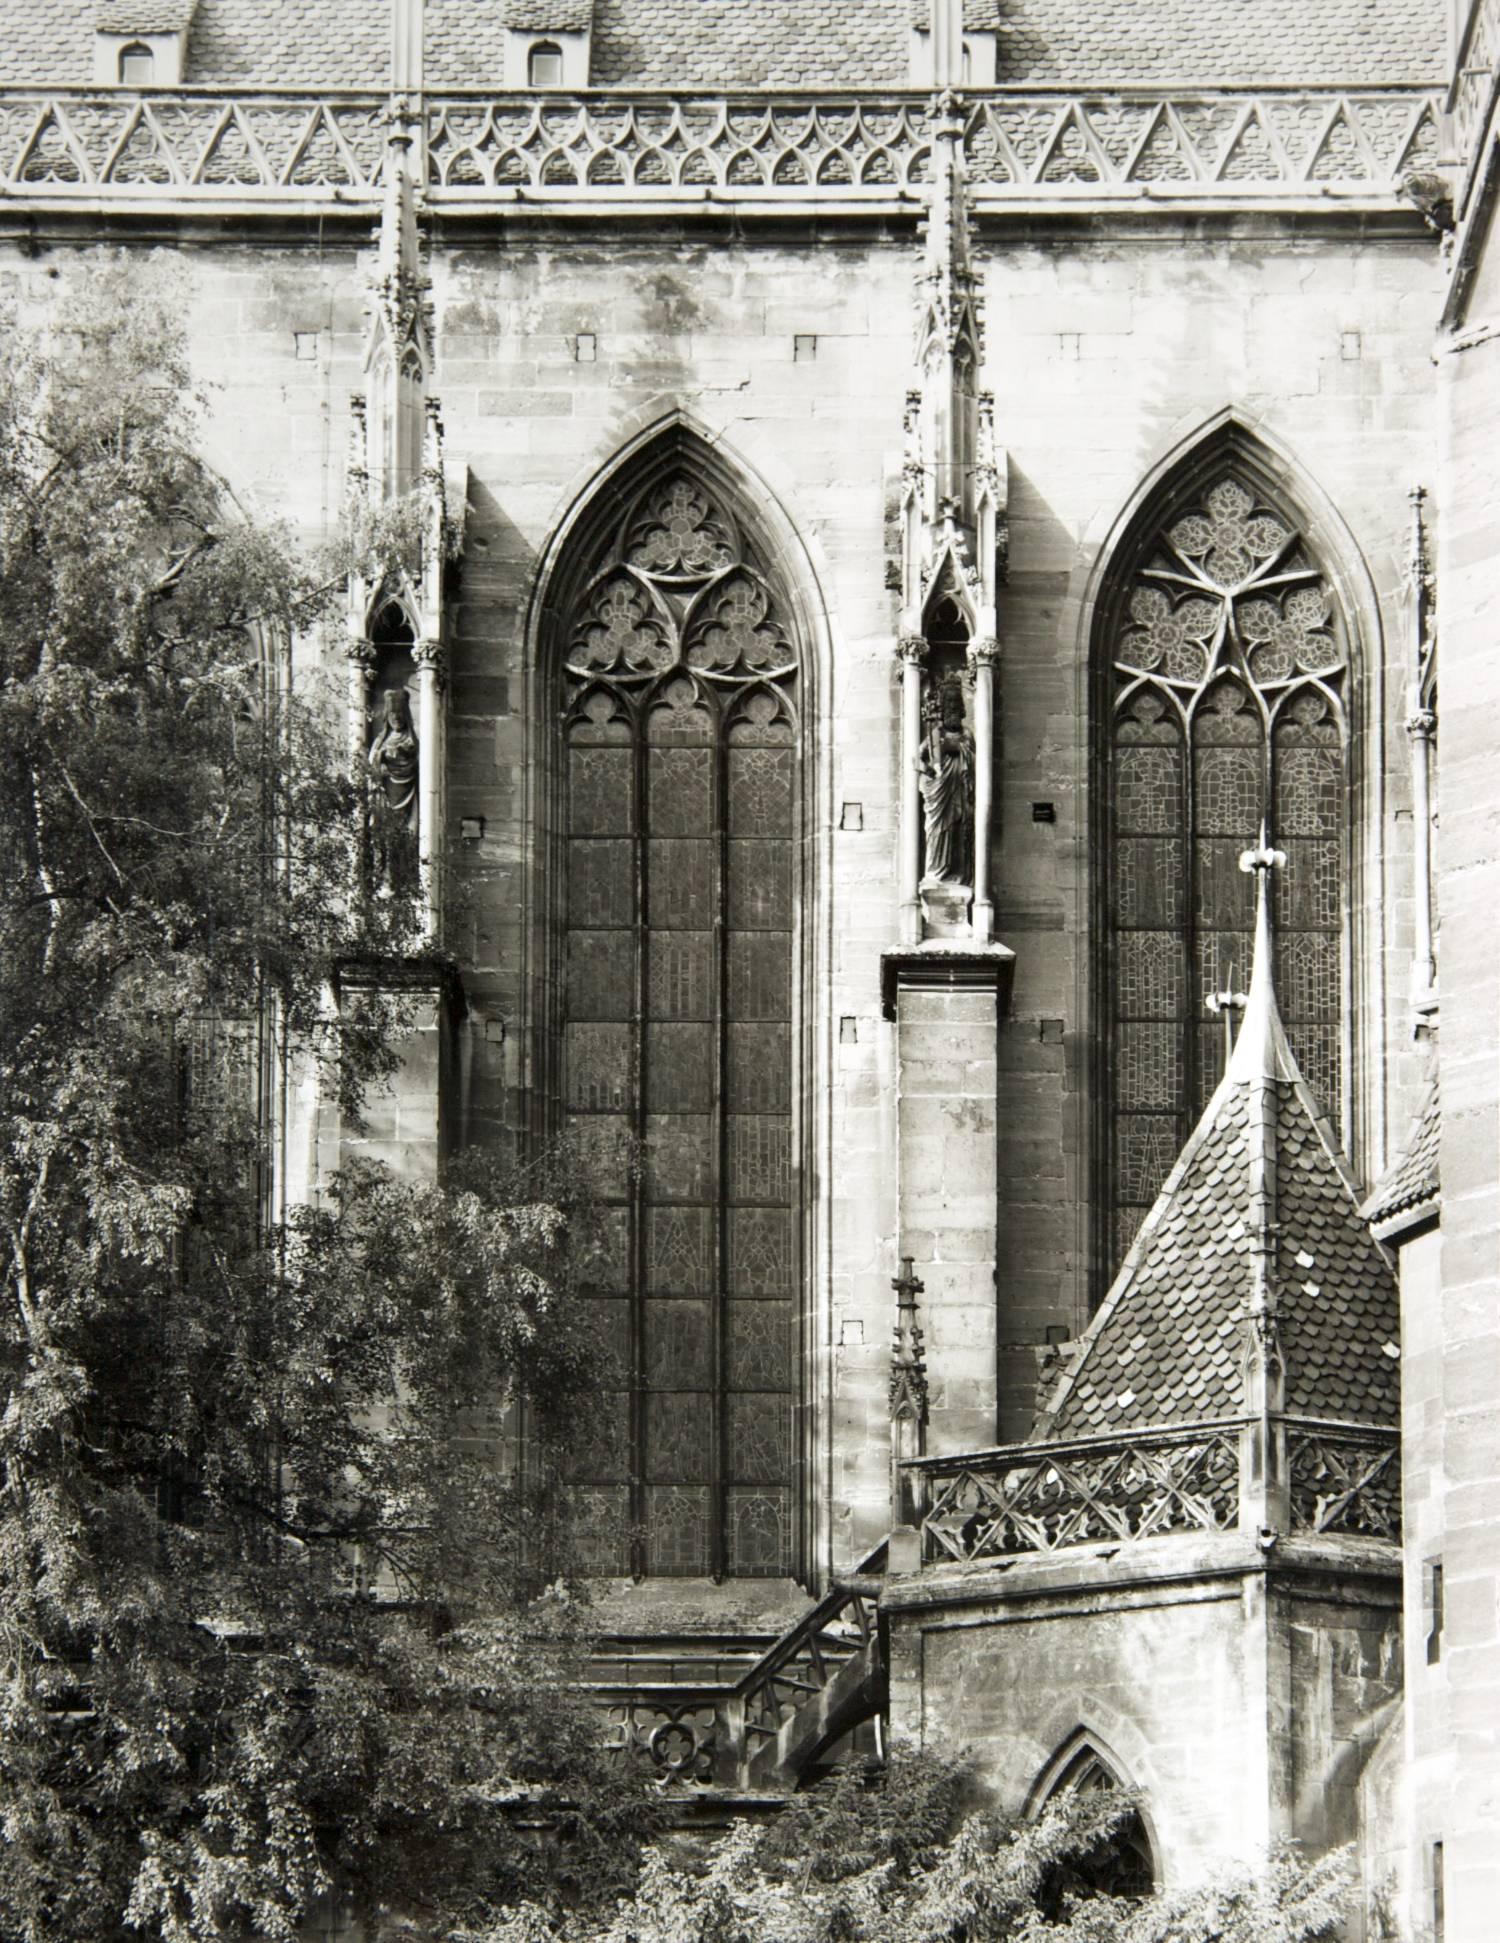 Église Saint Martin (Colmar, France)